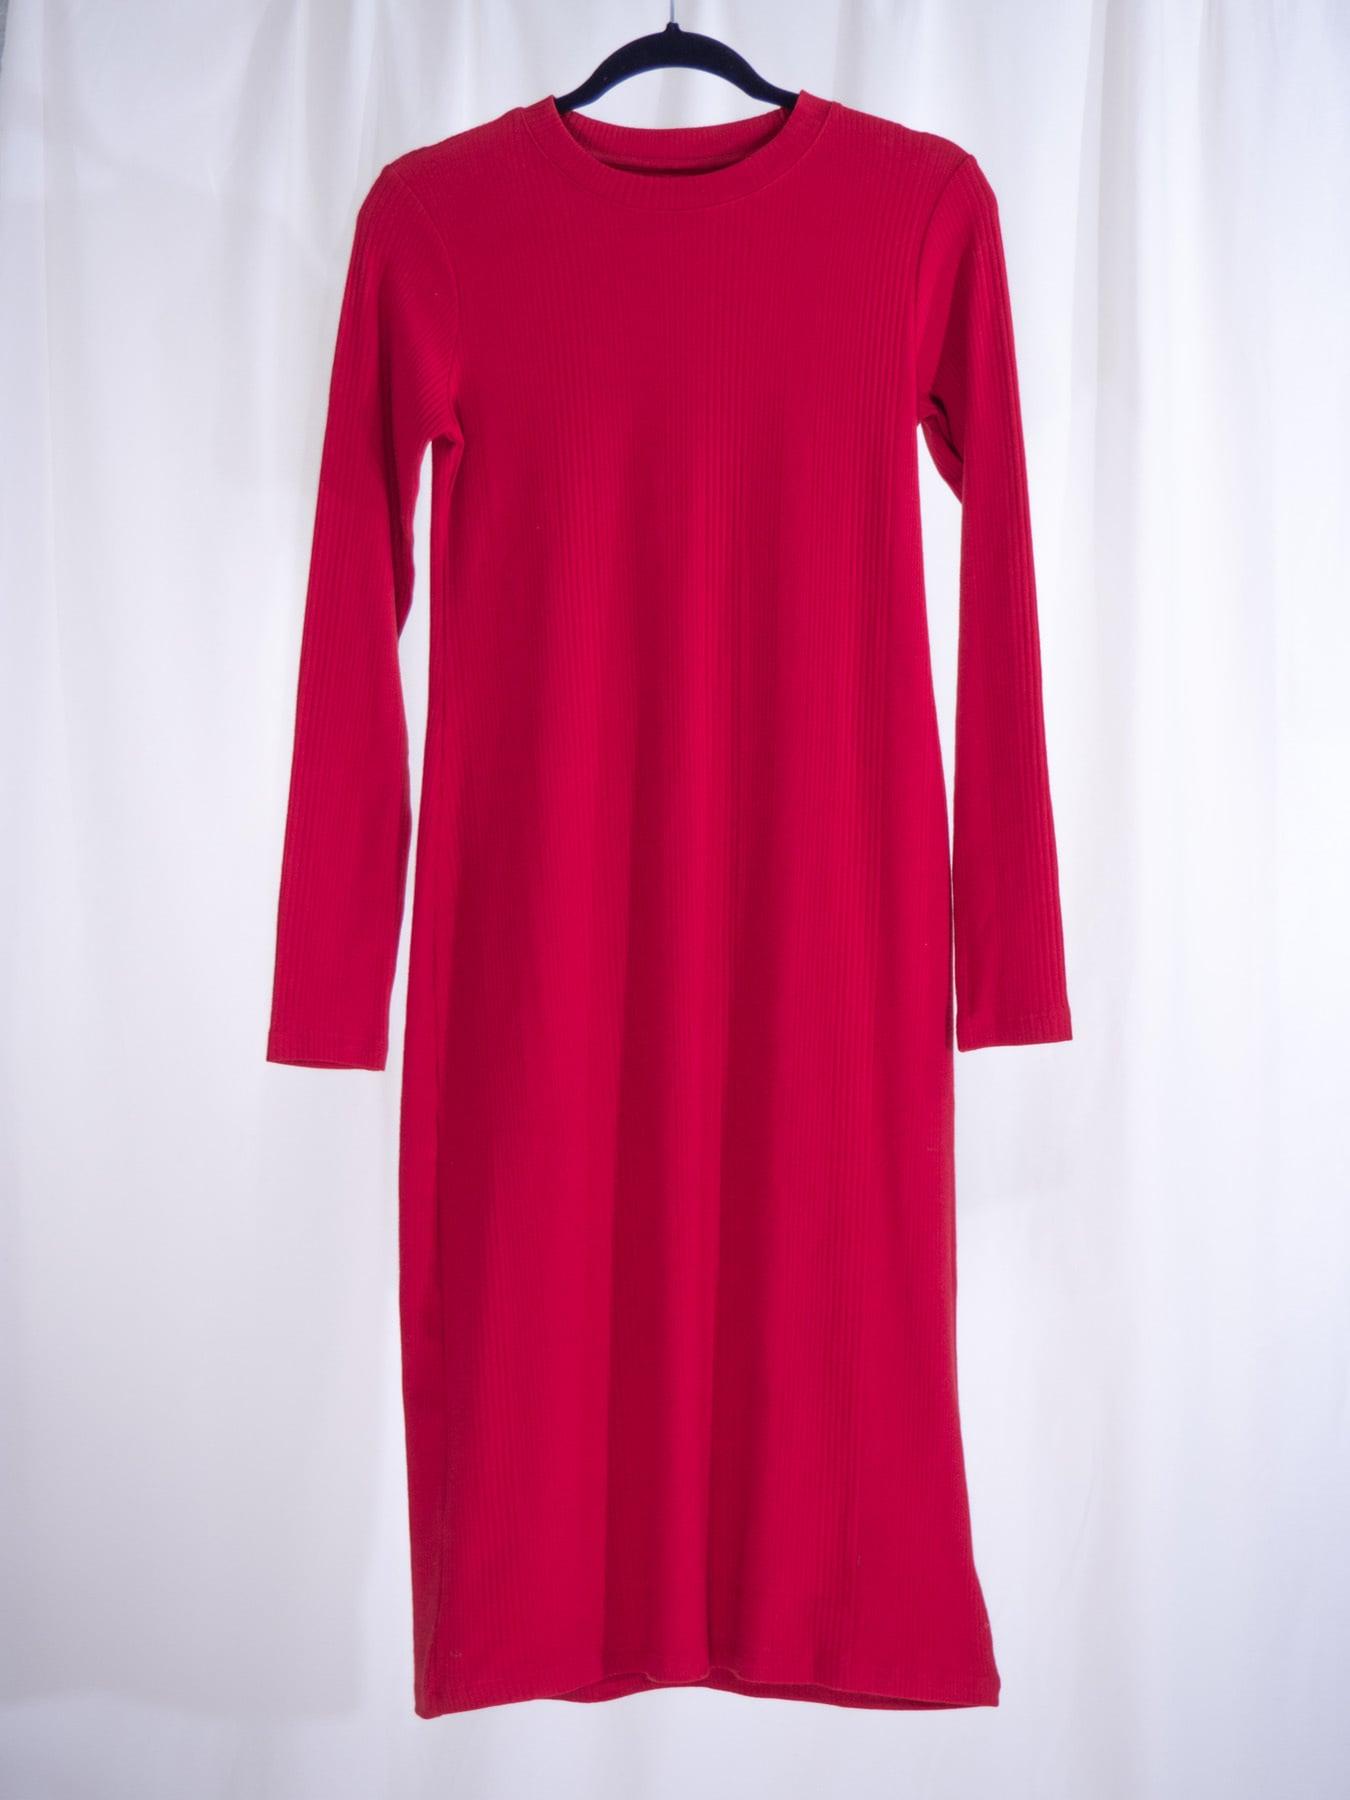 Ladder rib long sleeve dress